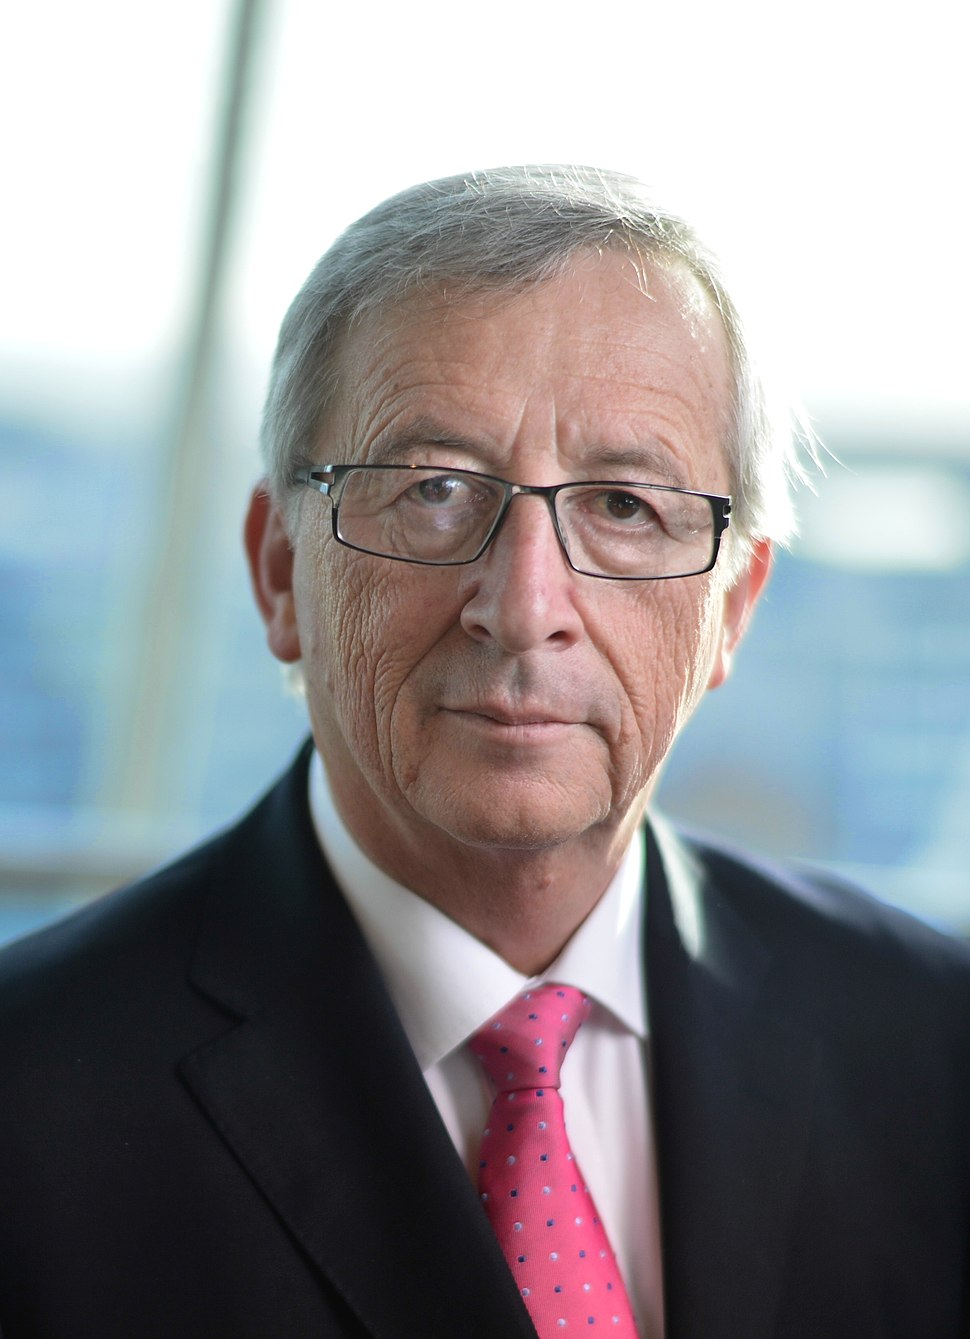 Ioannes Claudius Juncker die 7 Martis 2014